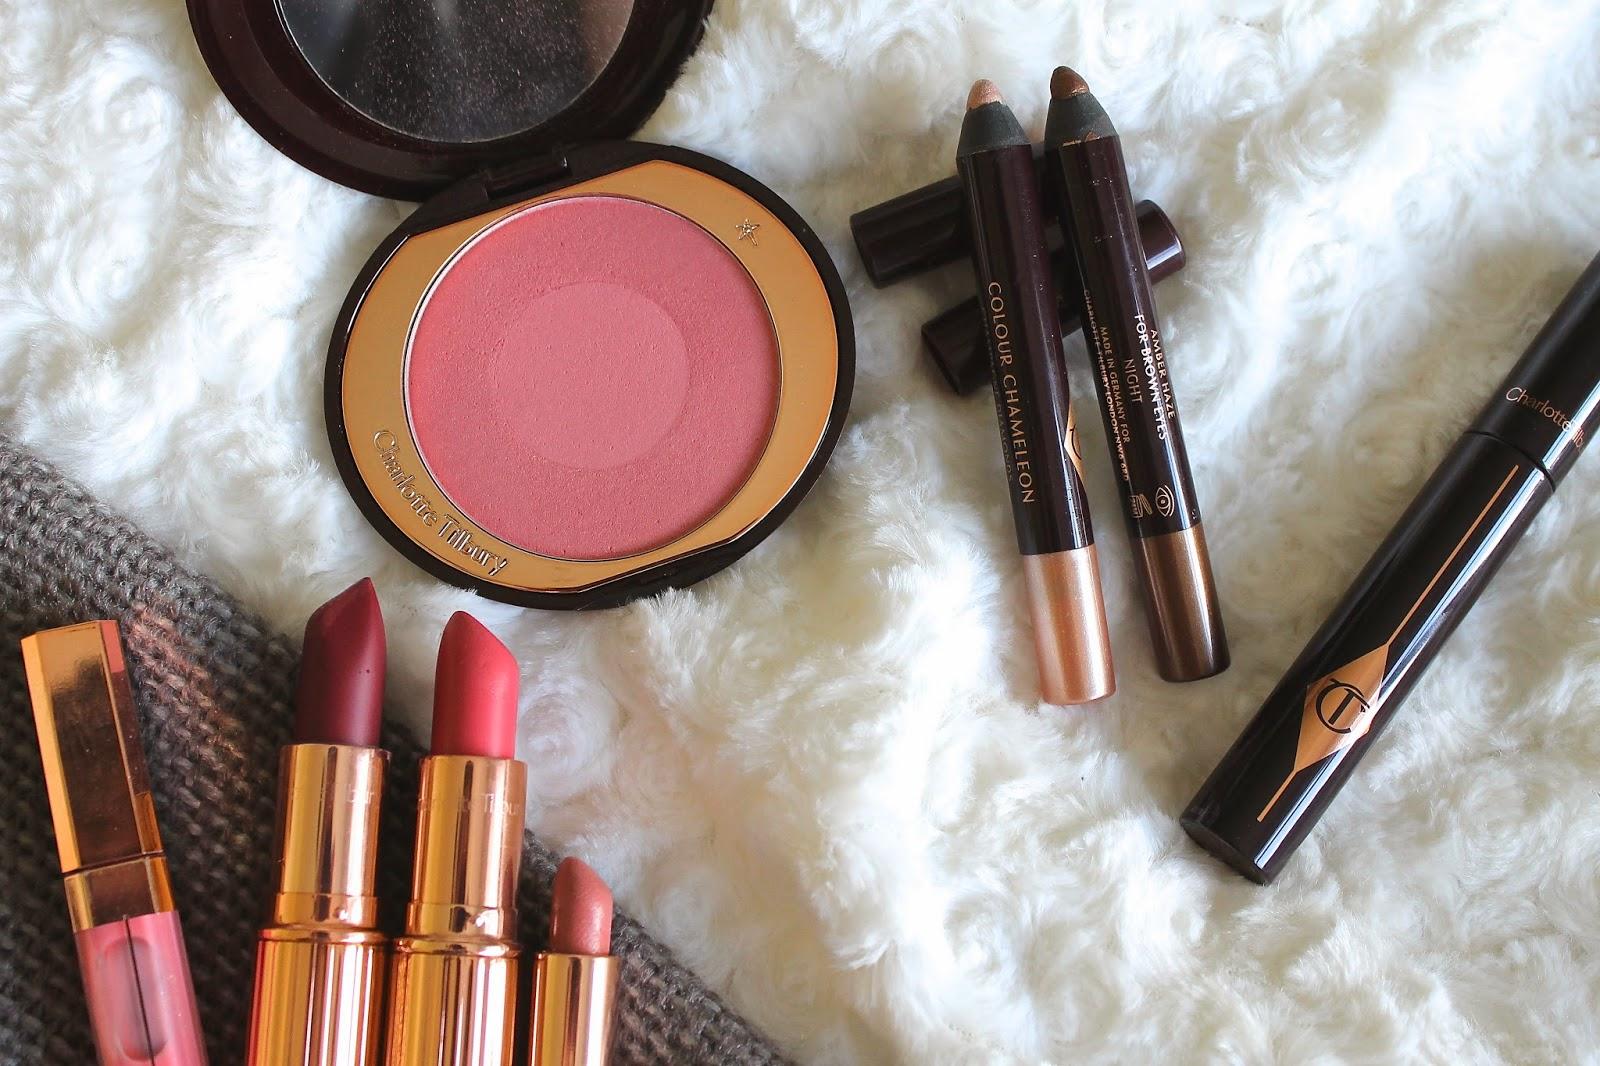 Charlotte Tilbury Matte Revolution Lipstick in Love Liberty